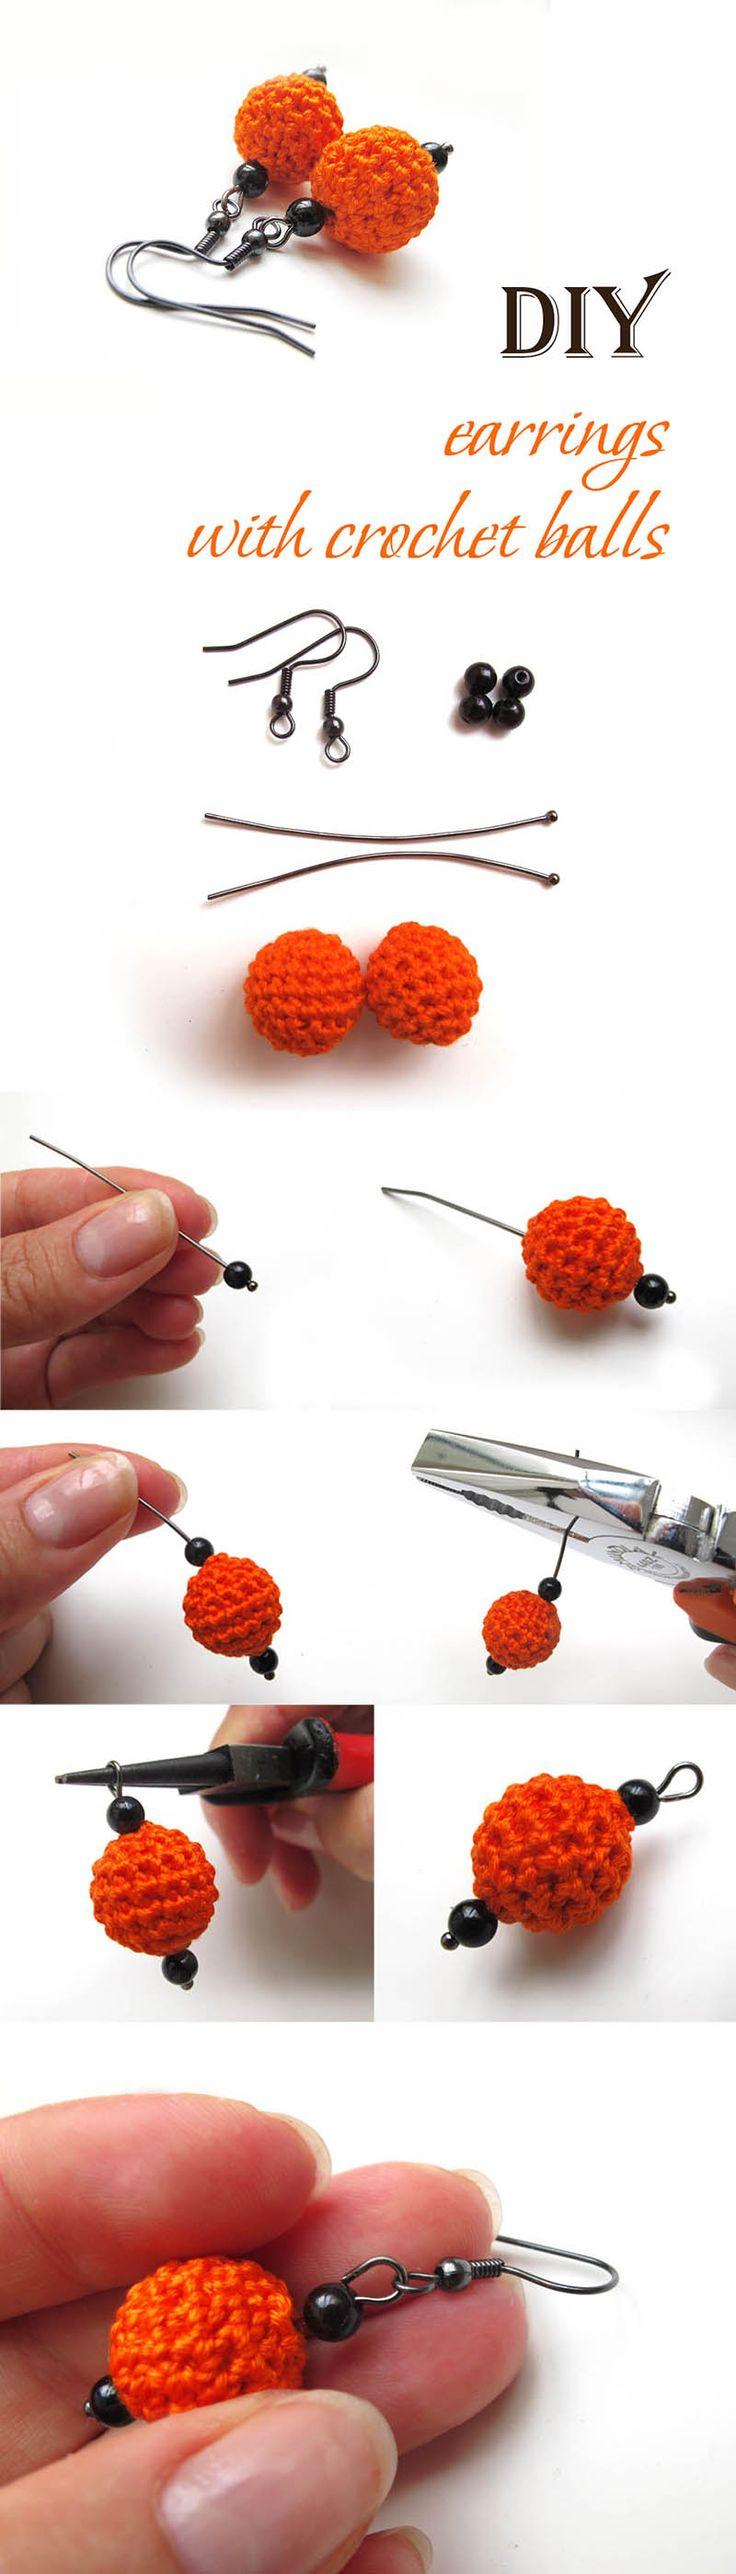 Earrings with crochet balls tutorial diy